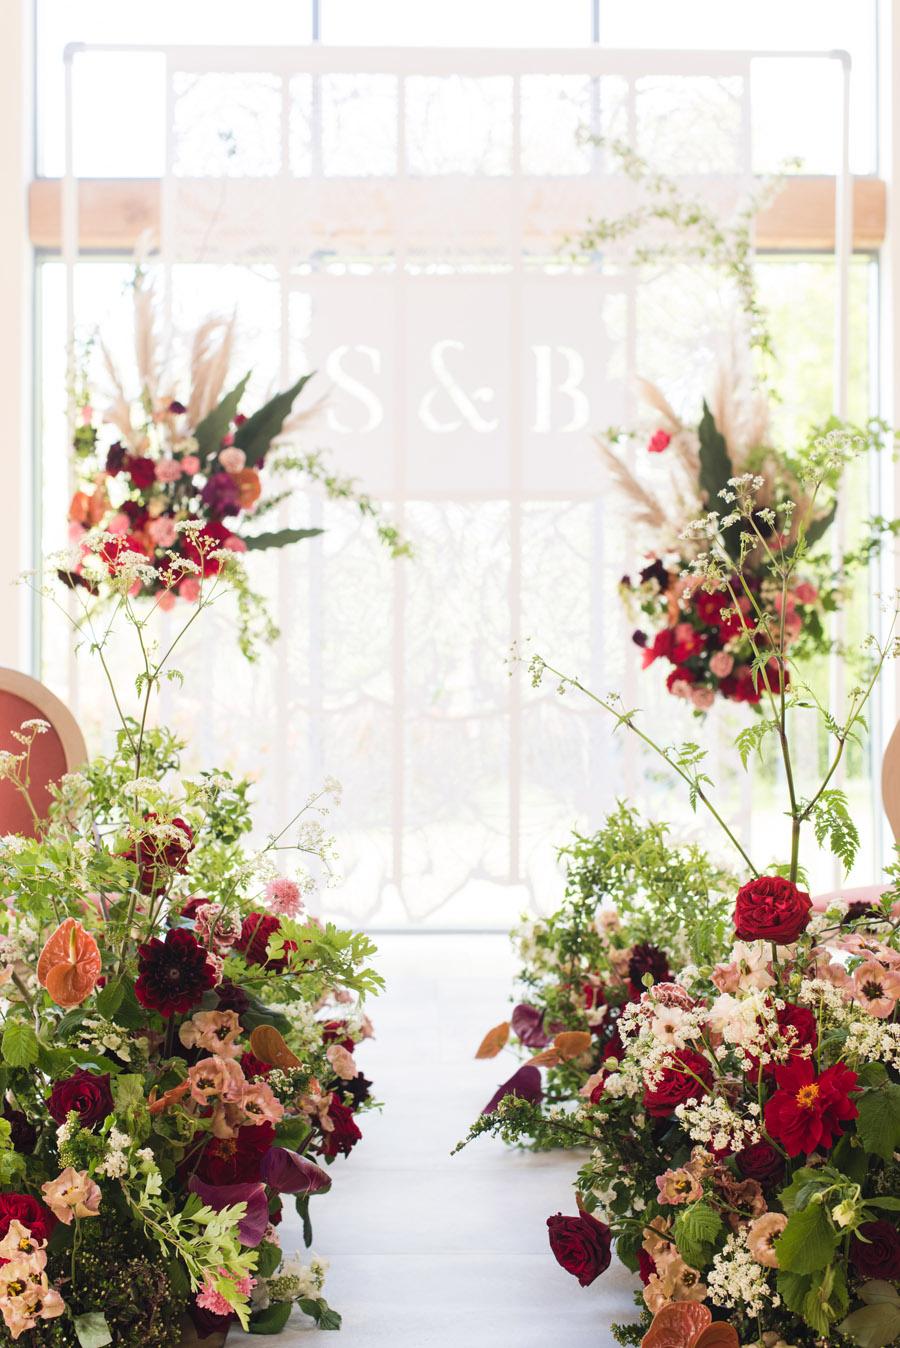 floral wedding ideas at Millbridge Court on English Wedding - photo credit Julie Michaelsen Photography (10)